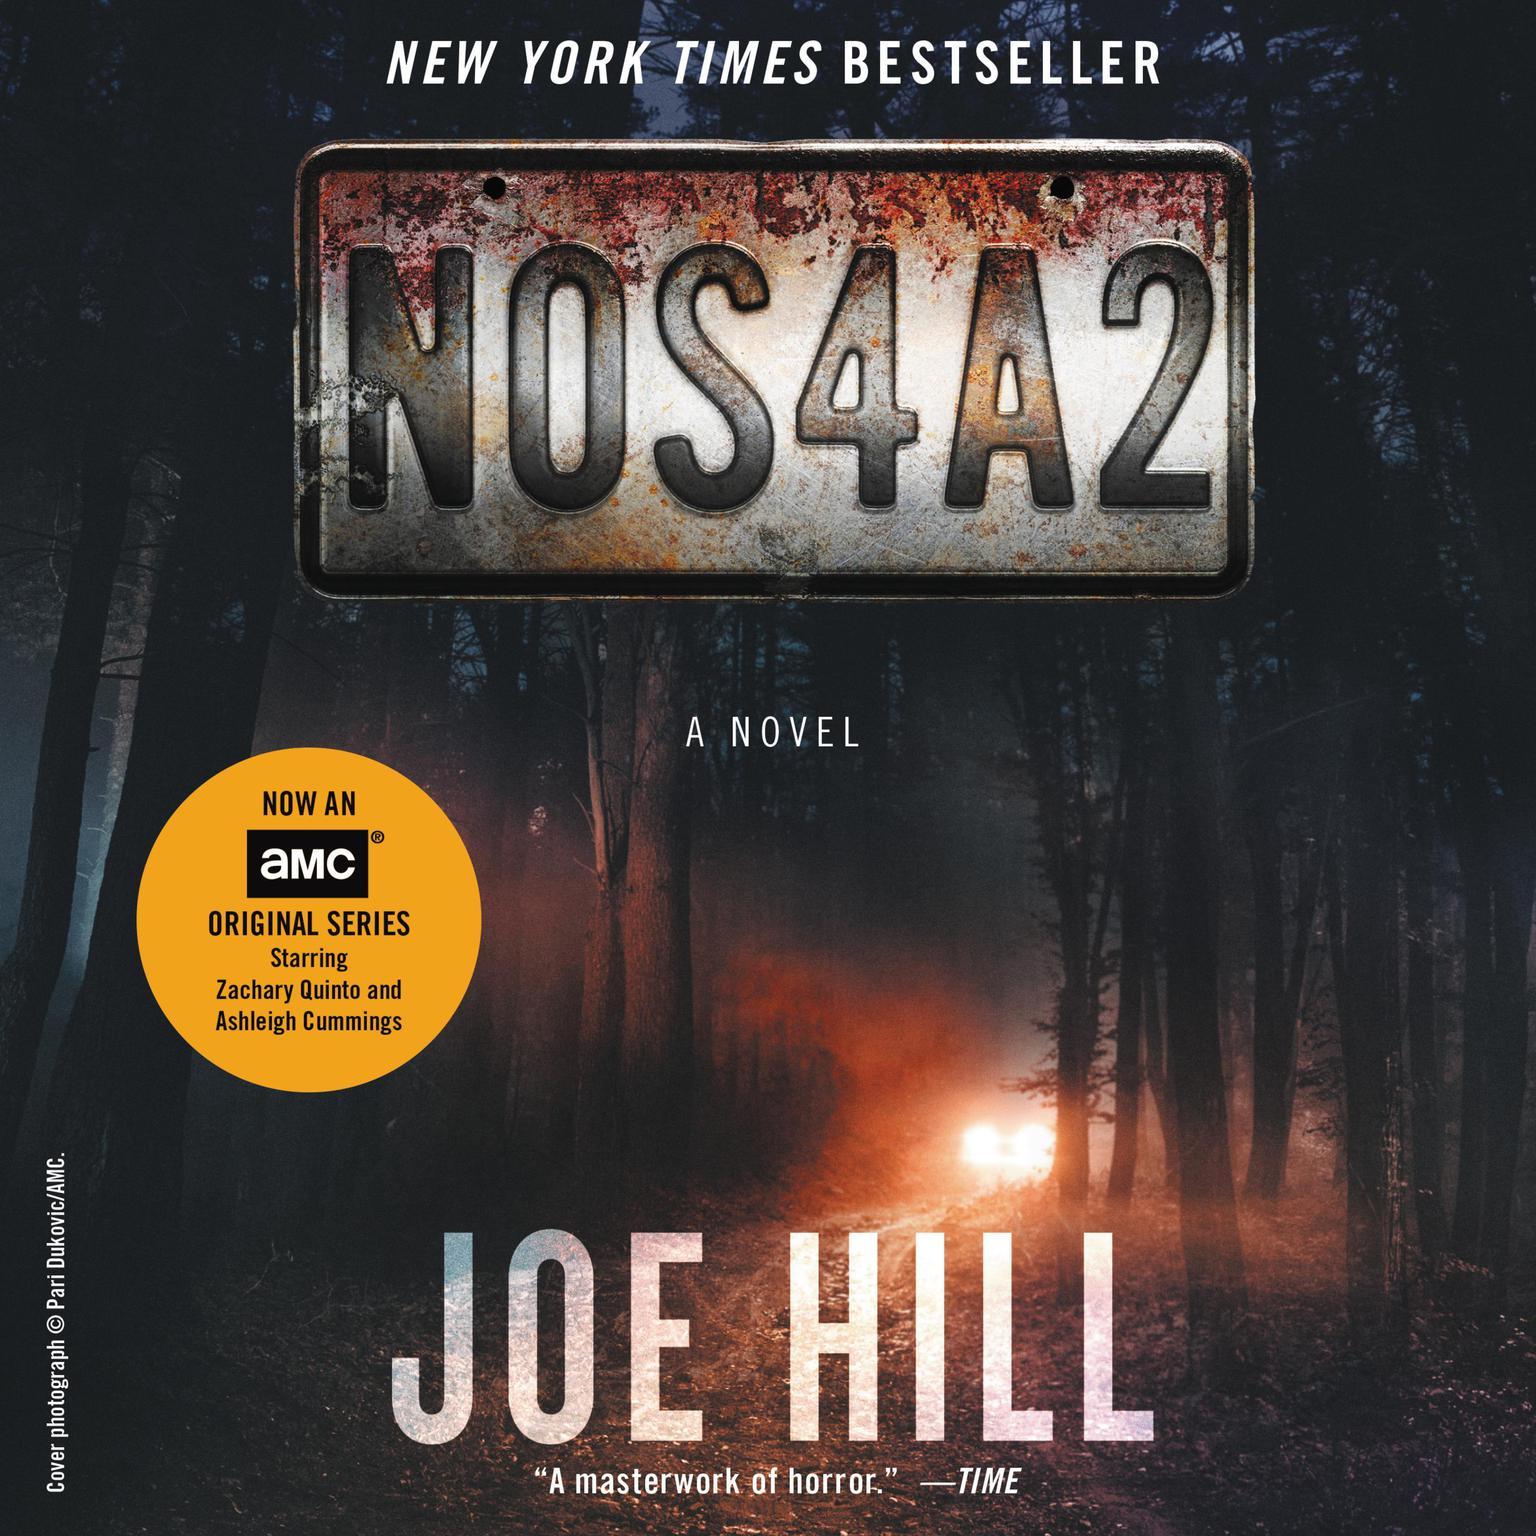 Printable NOS4A2: A Novel Audiobook Cover Art